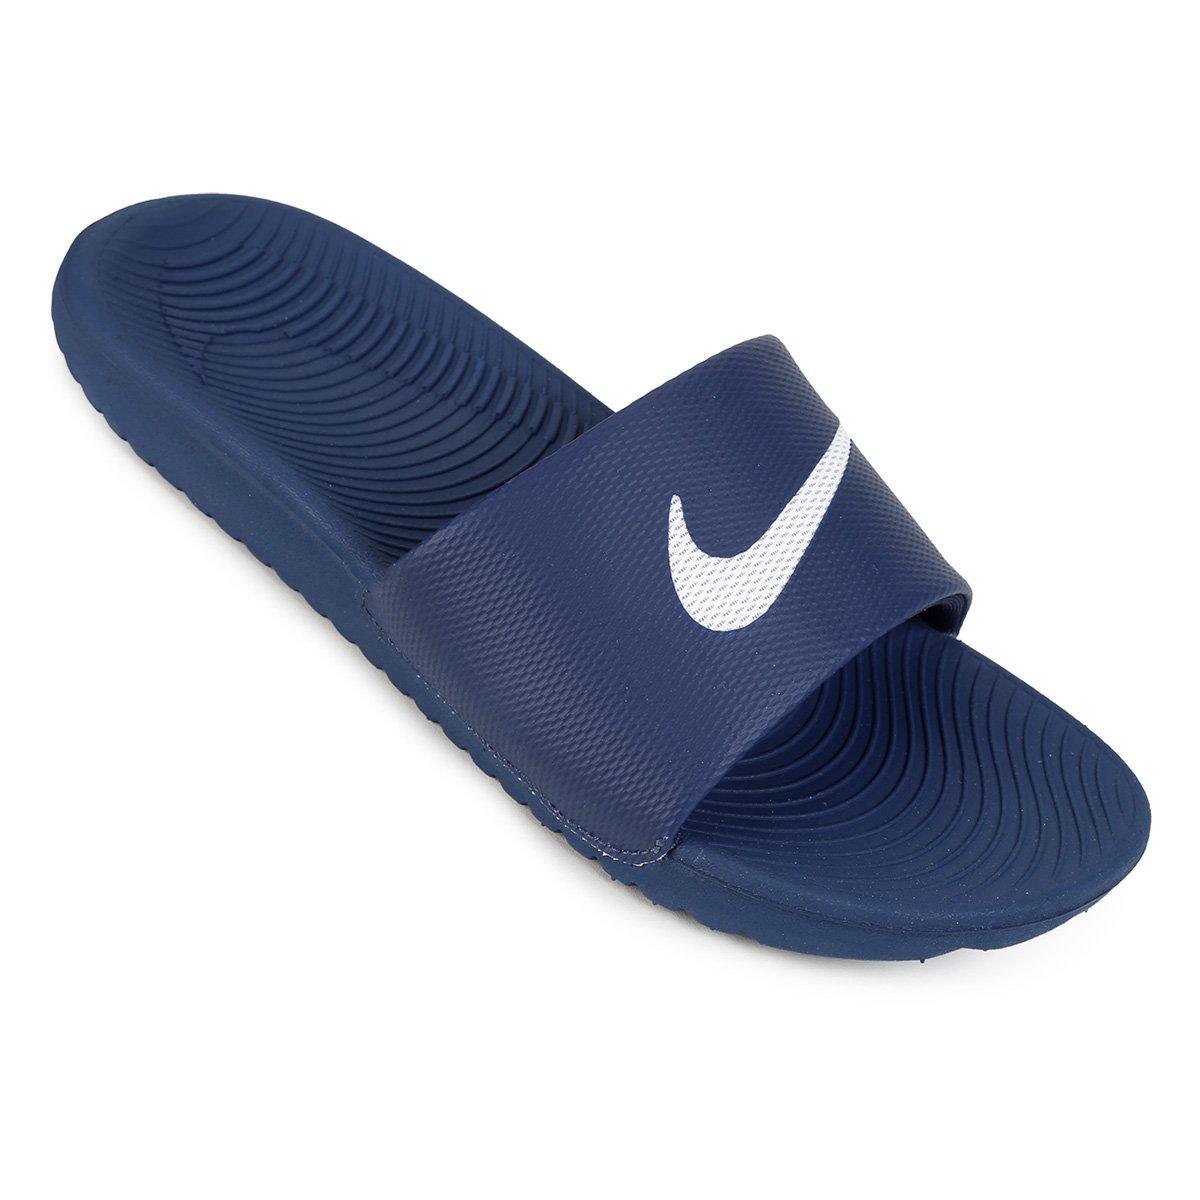 Nike Kawa Azul Sandália Slide Kawa Sandália Branco Masculina Nike Slide e Masculina PPdYrw